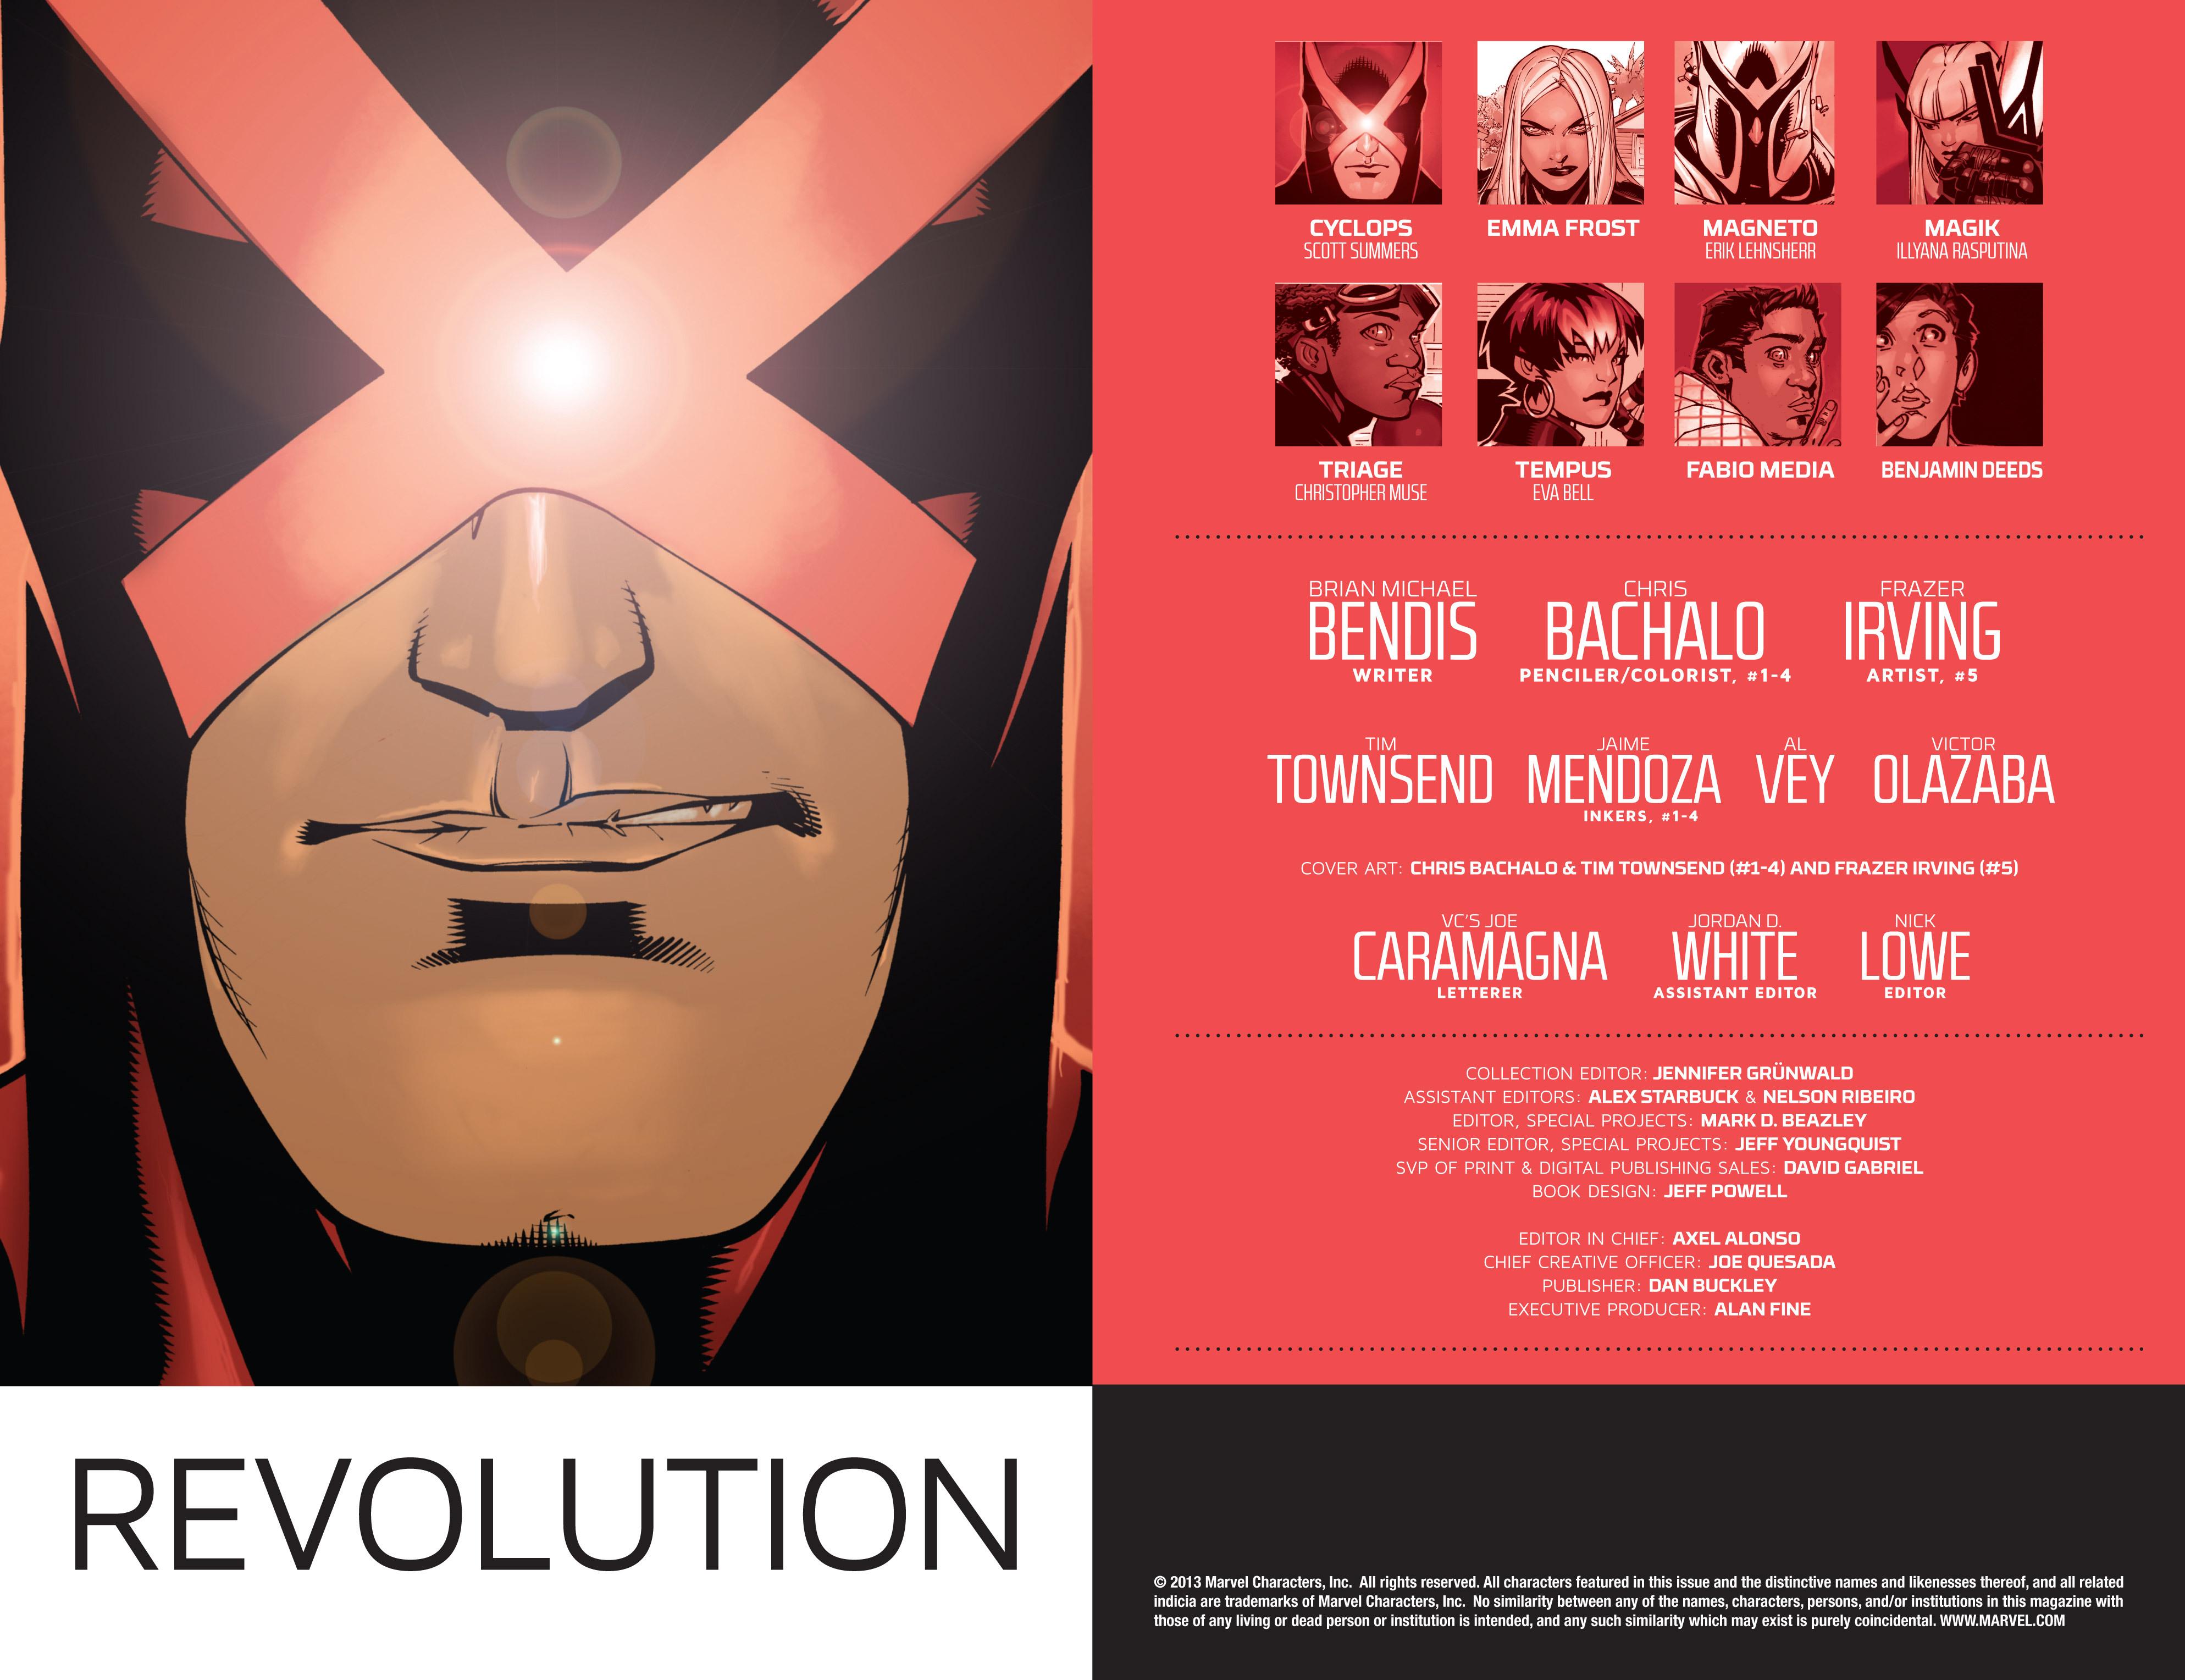 Read online Uncanny X-Men (2013) comic -  Issue # _TPB 1 - Revolution - 107